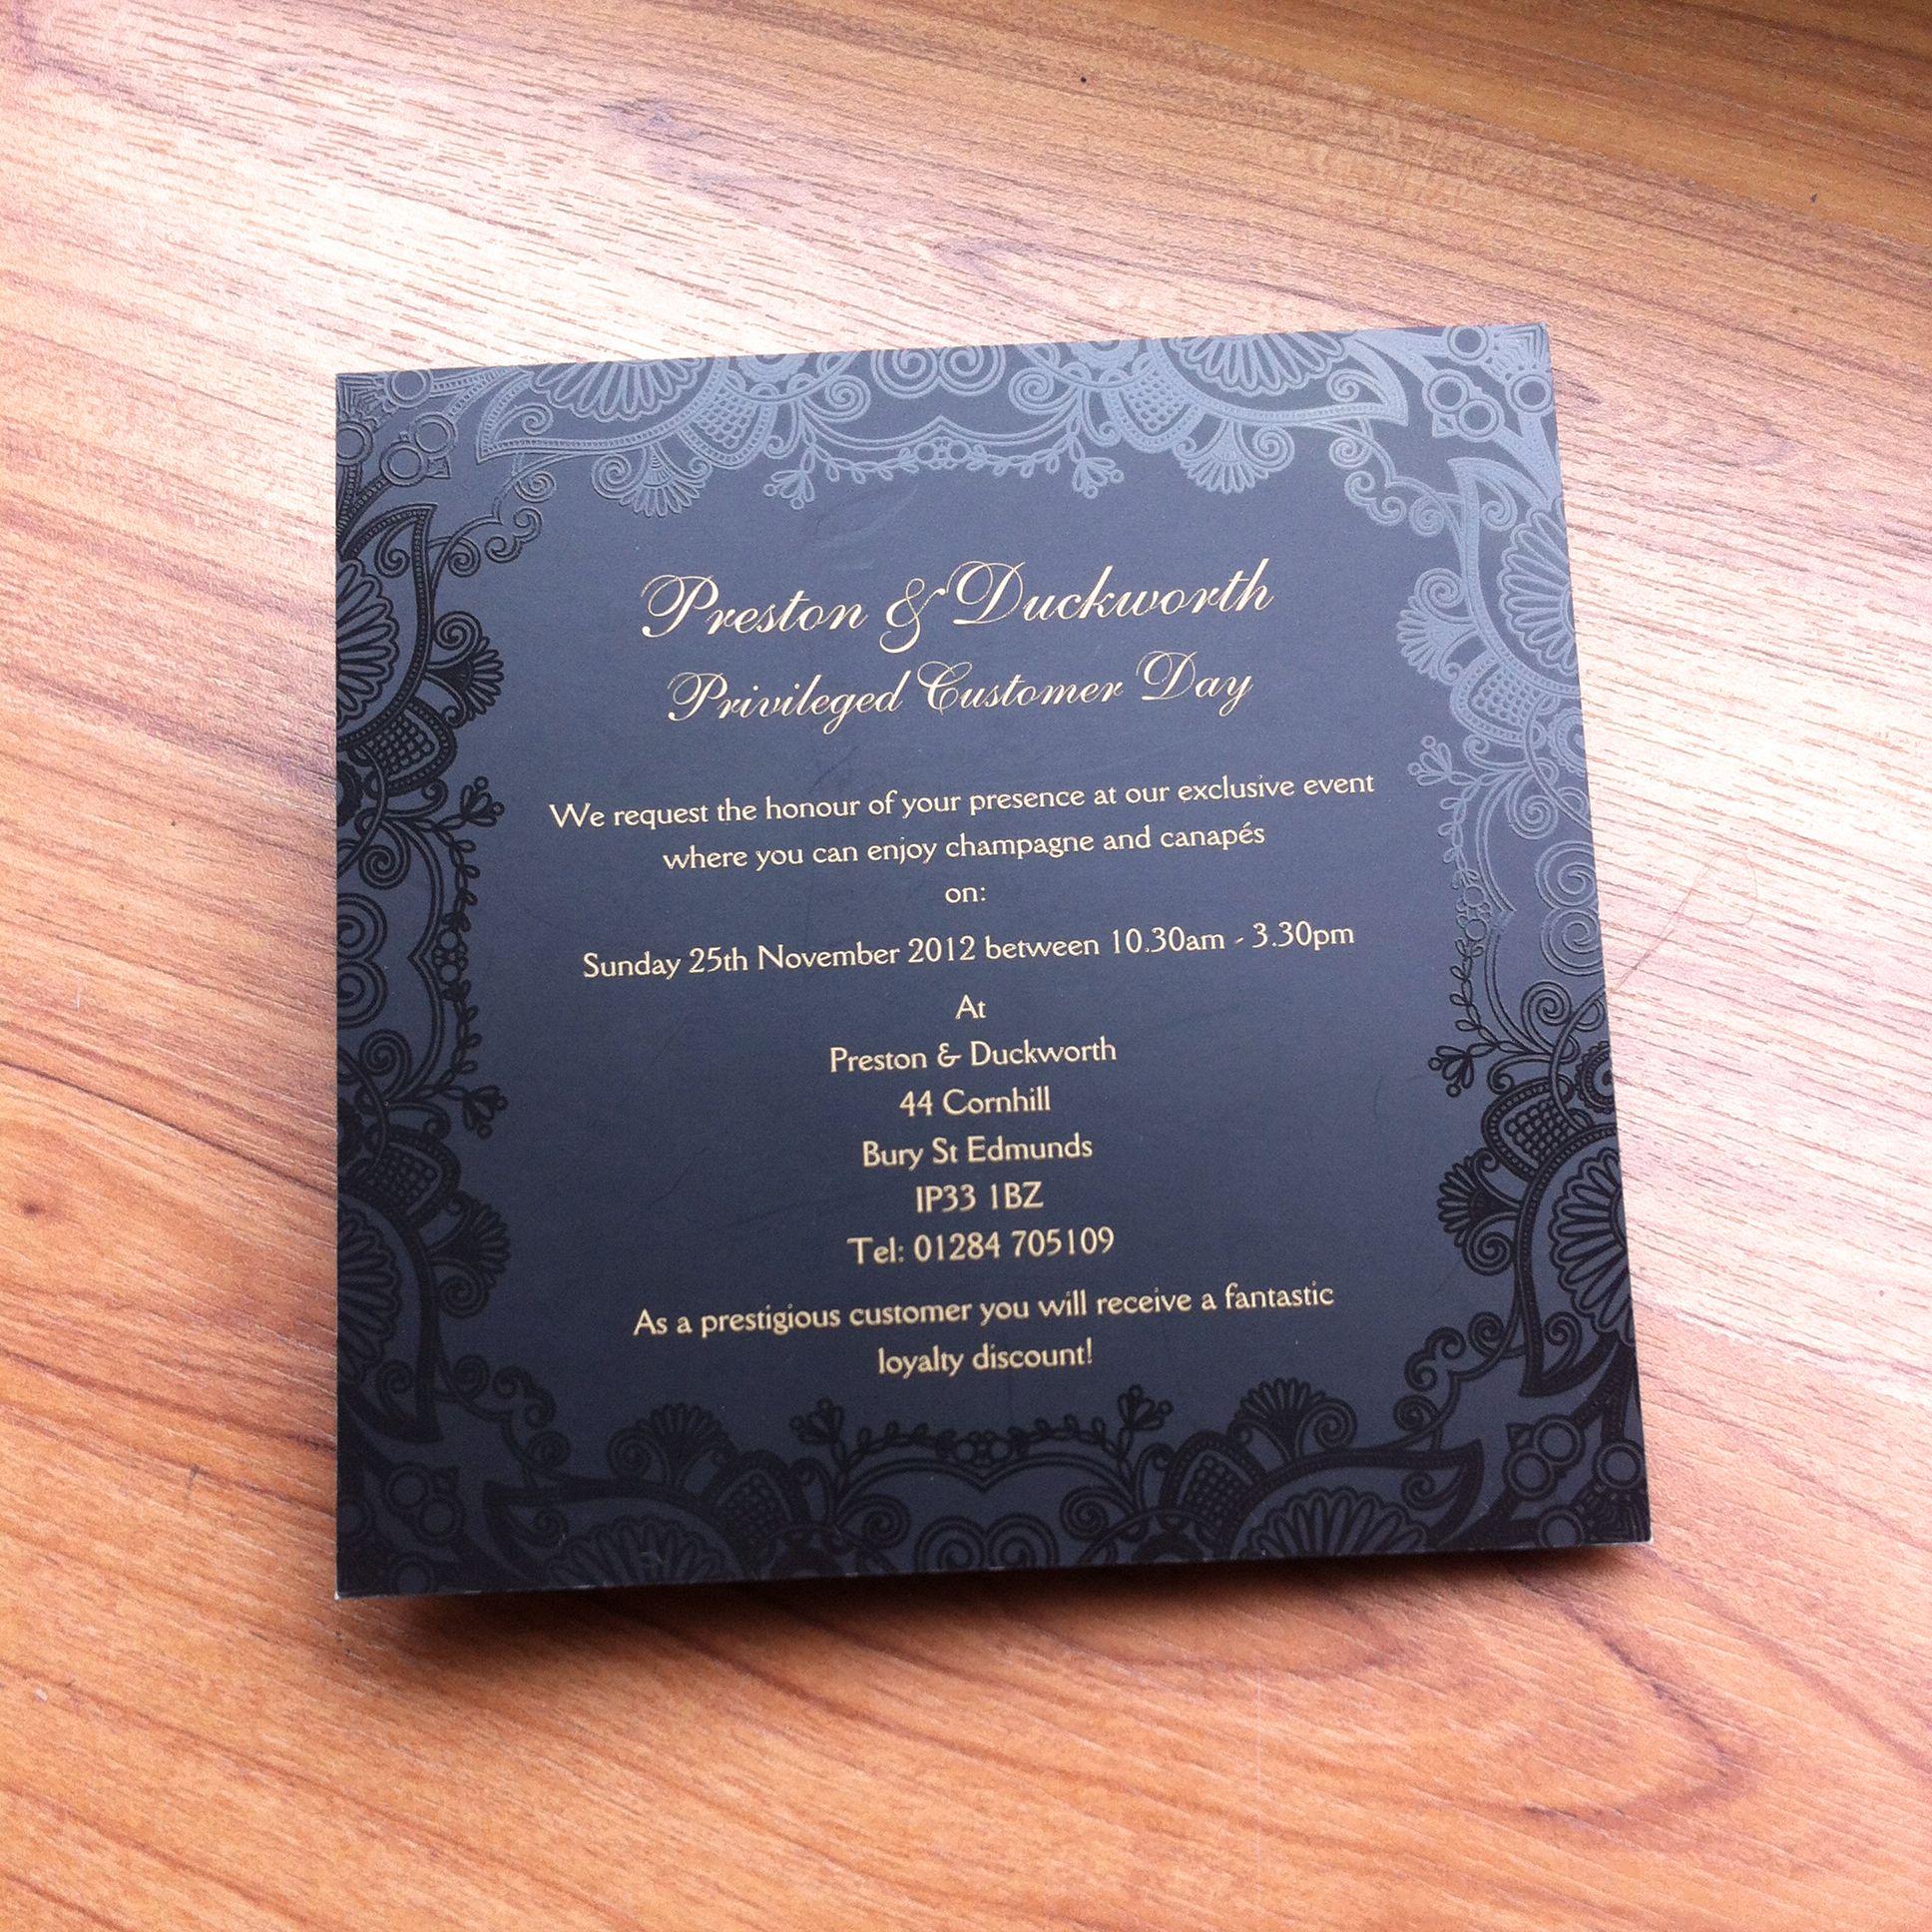 Spot Uv Invitation 400gsm Silk With Matt Lamination And Spot Uv Varnish Spot Uv Invitations How To Make An Envelope